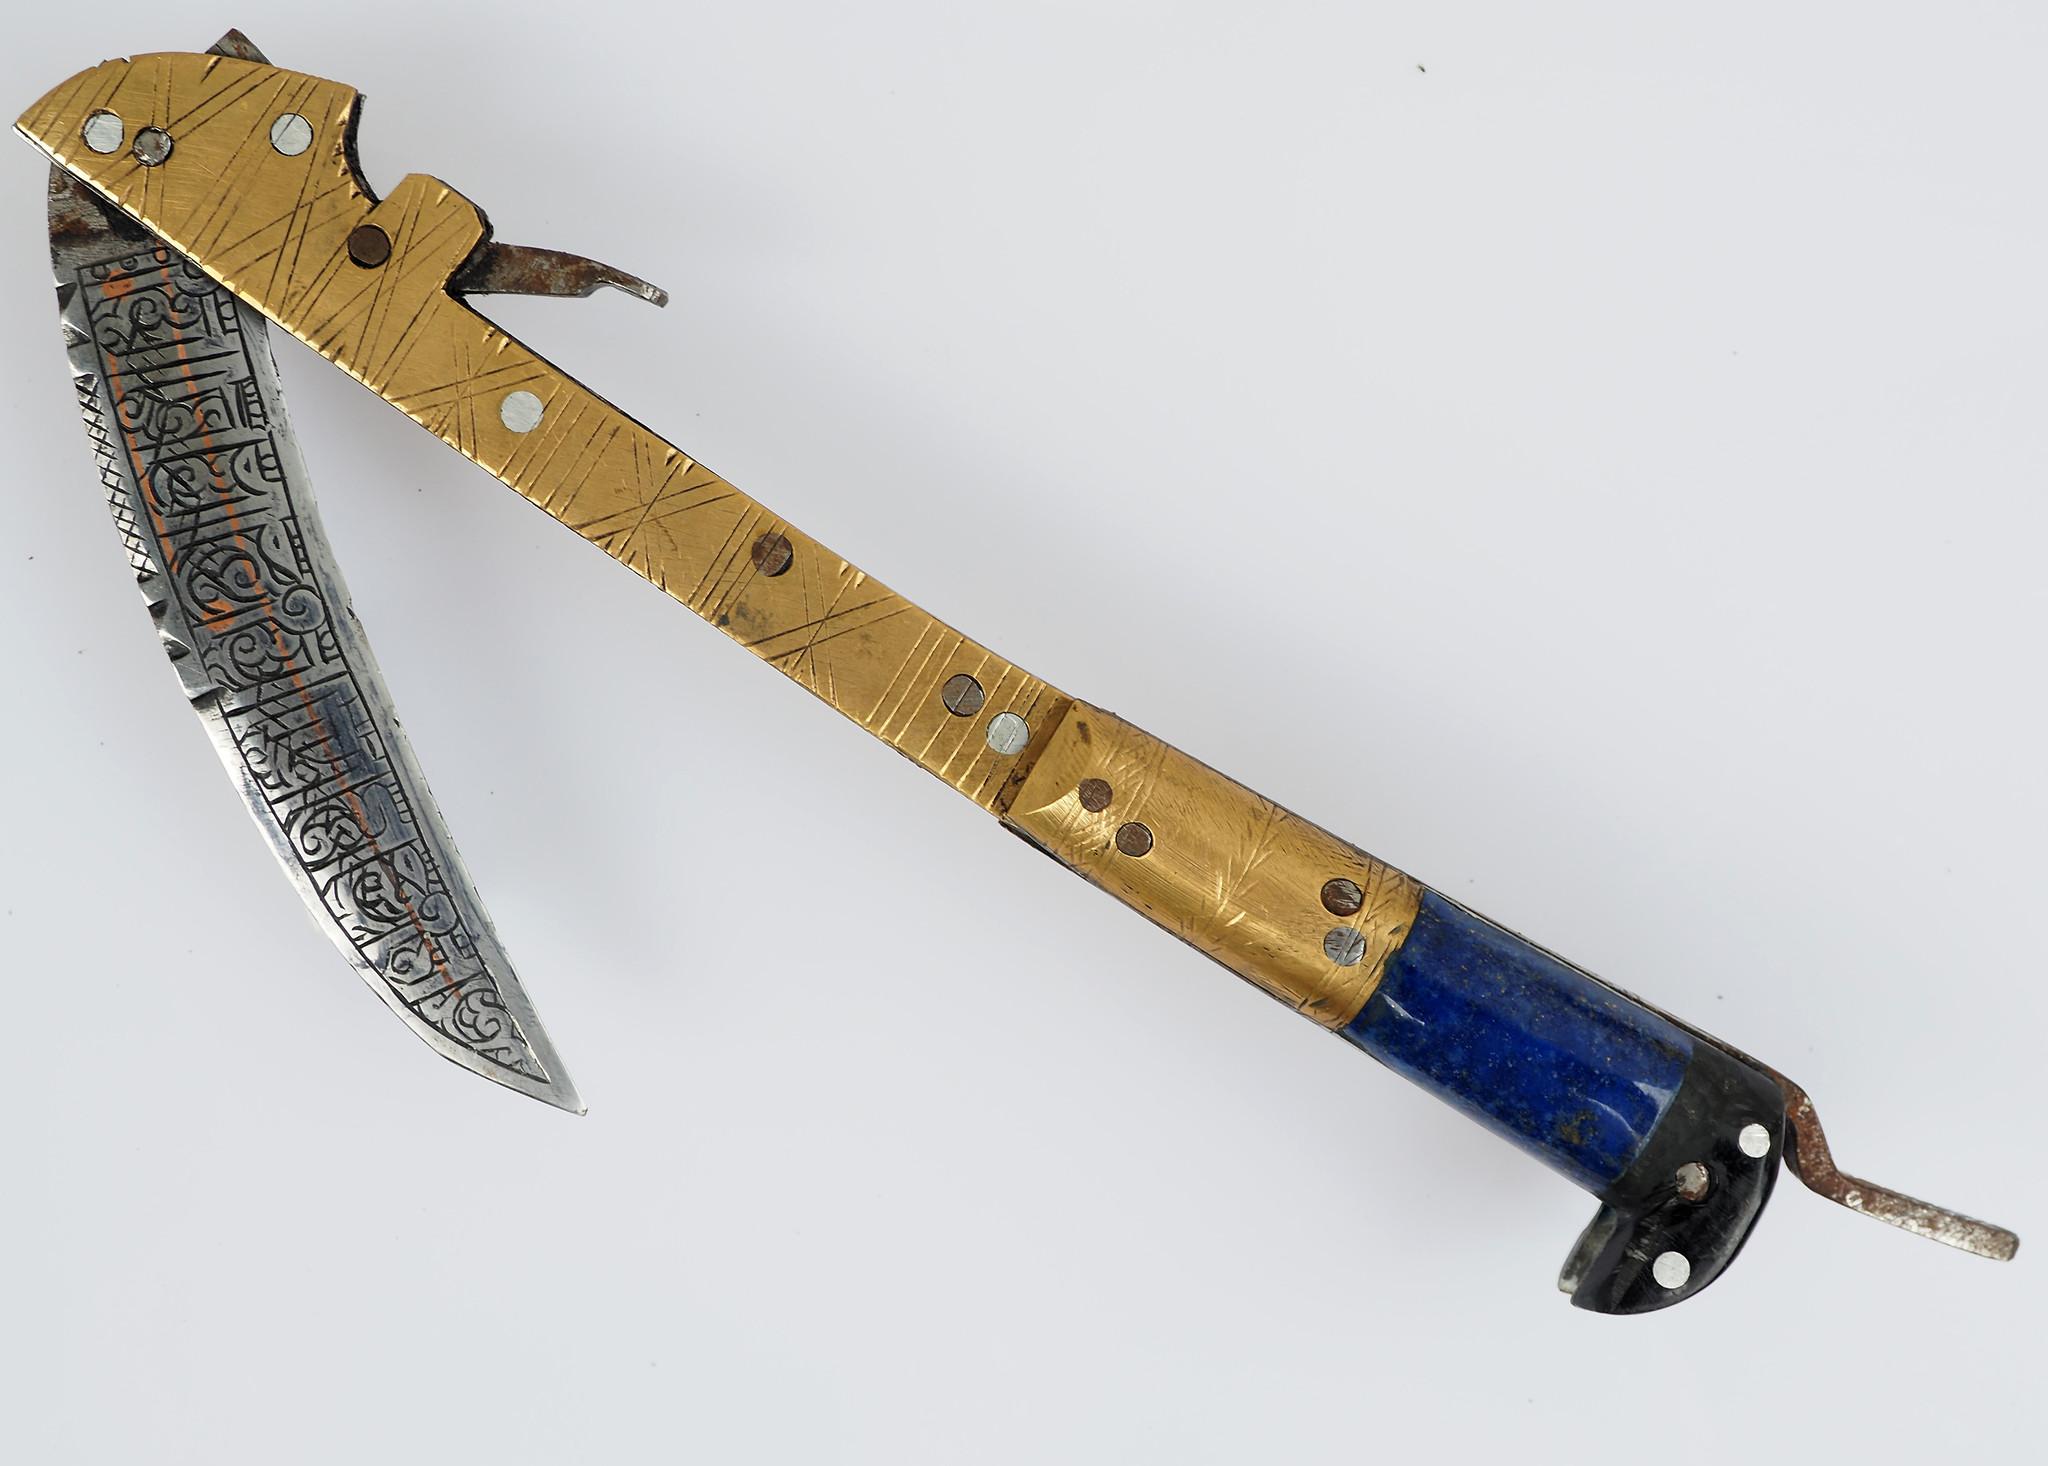 28 cm Knife Islamic scythe Short sword Dagger choora Pesh kabze  lohar Knife Khyber sickle Pick lapis  handle afghanistan pakistan :21H